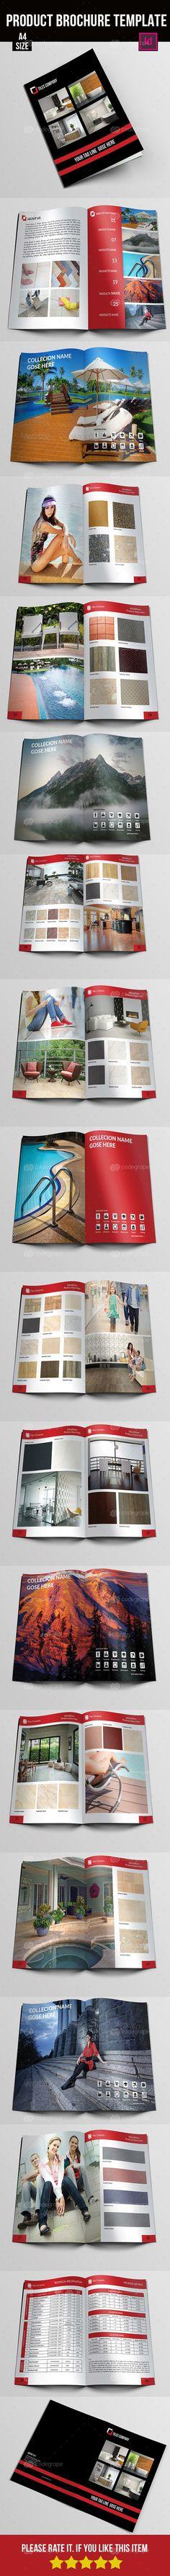 Tiles / Product Brochure - http://www.codegrape.com/item/tiles-product-brochure/7875